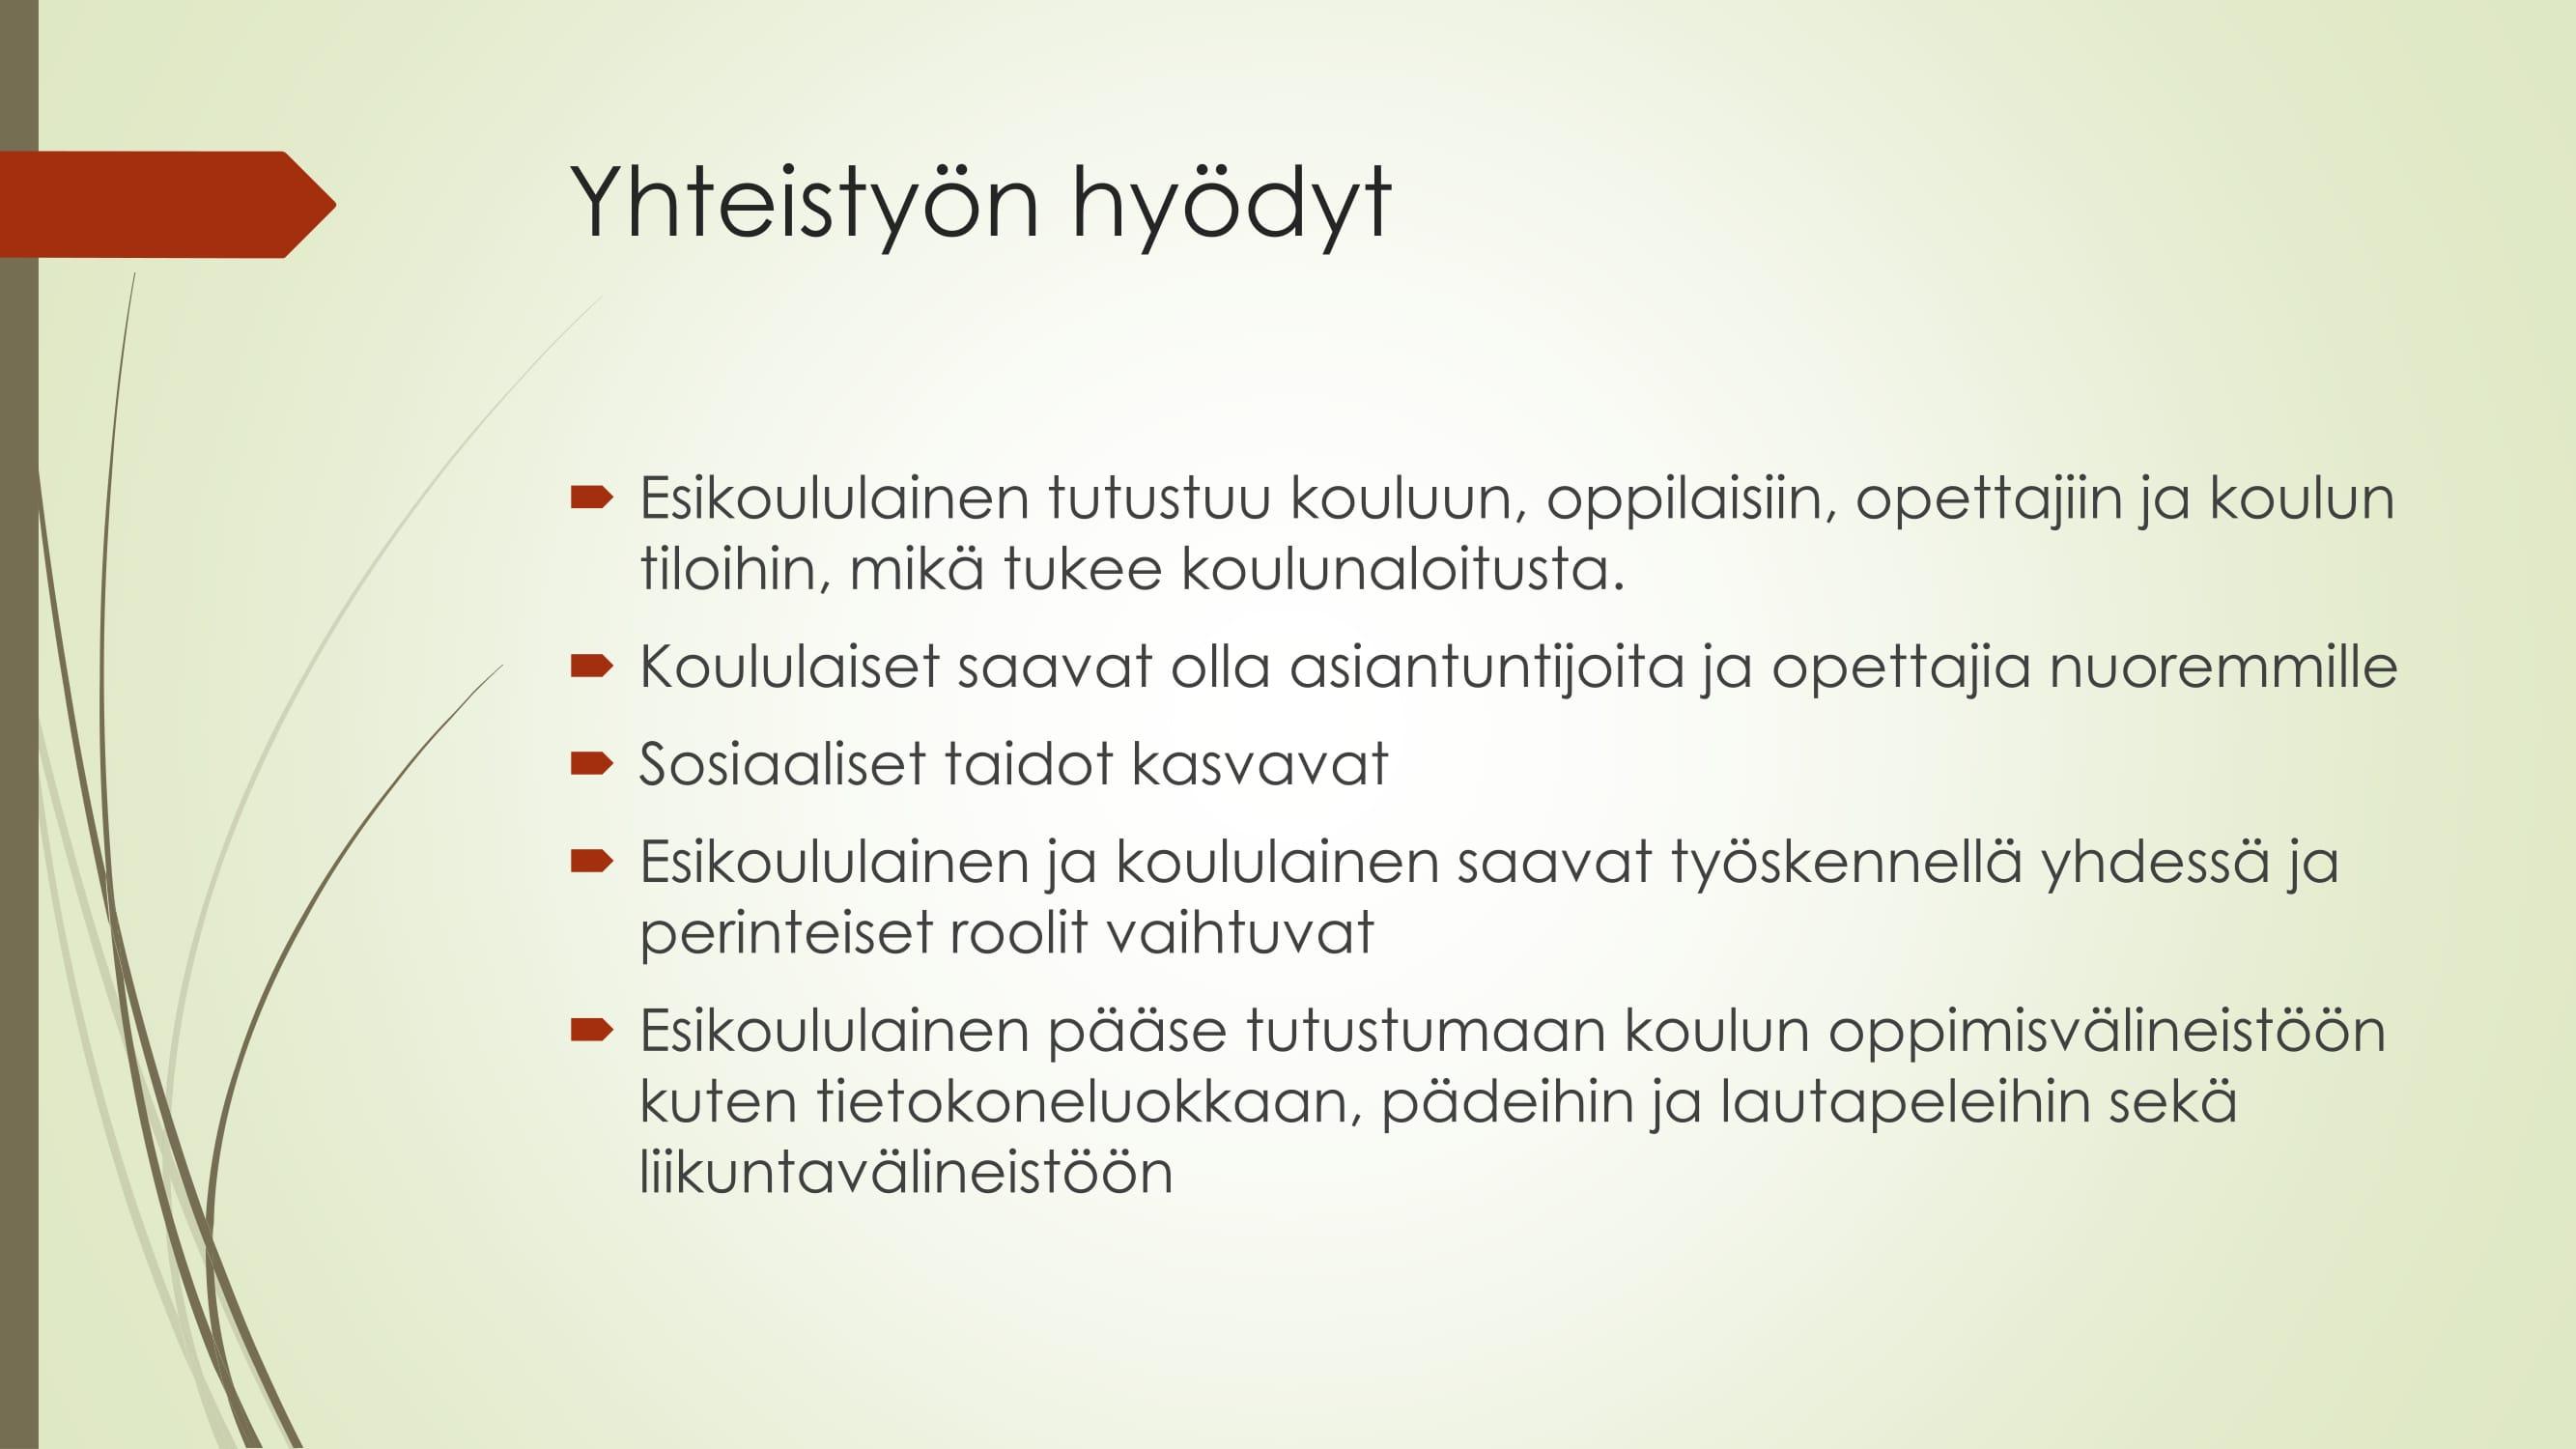 esi-alku-akt-6